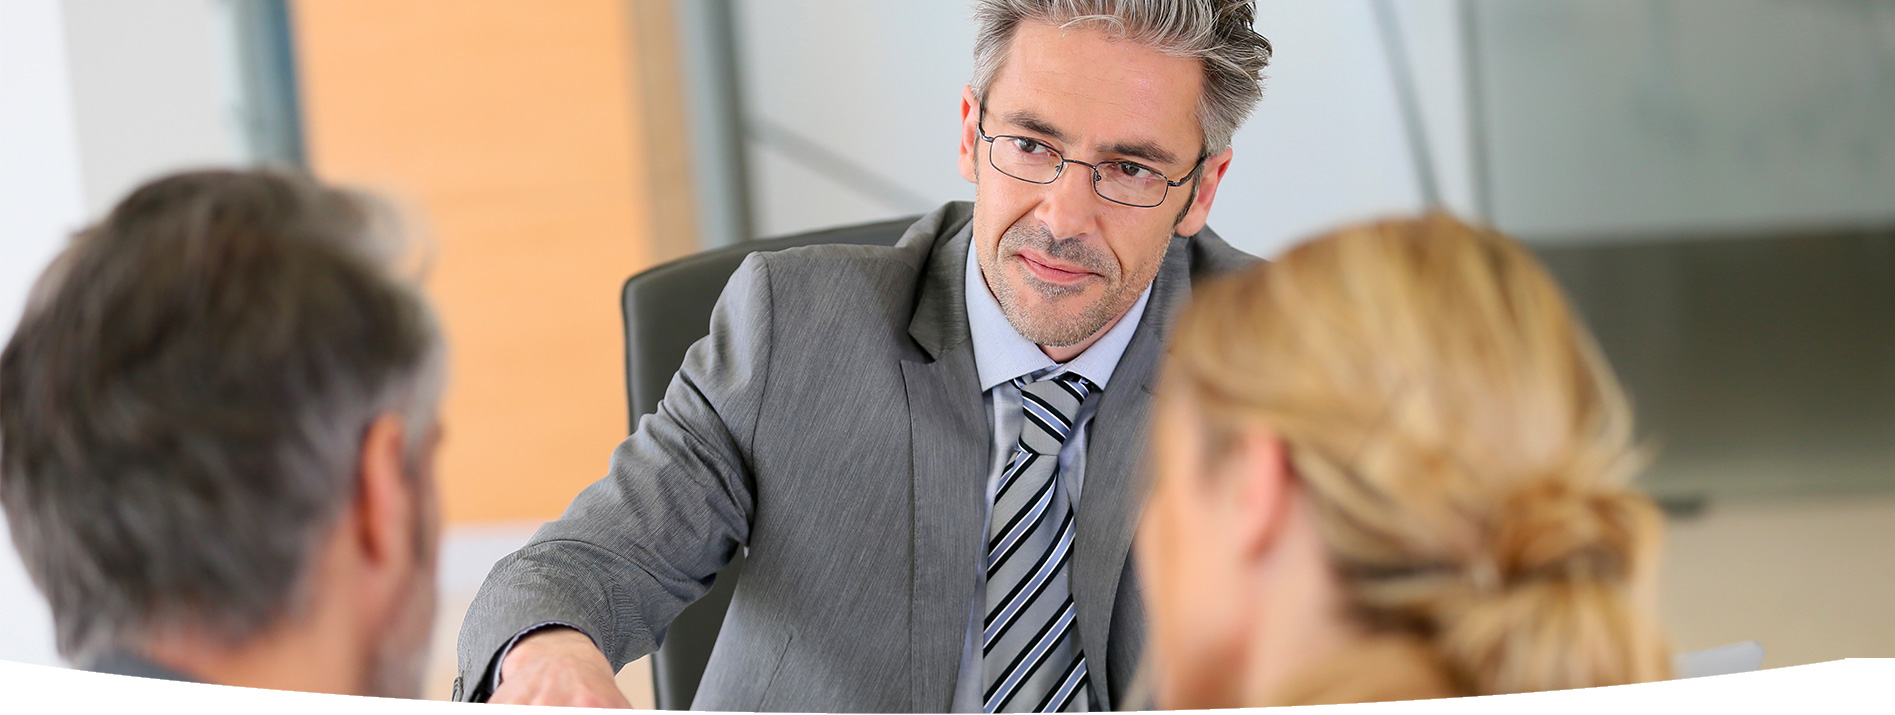 HR Technology Consultancy